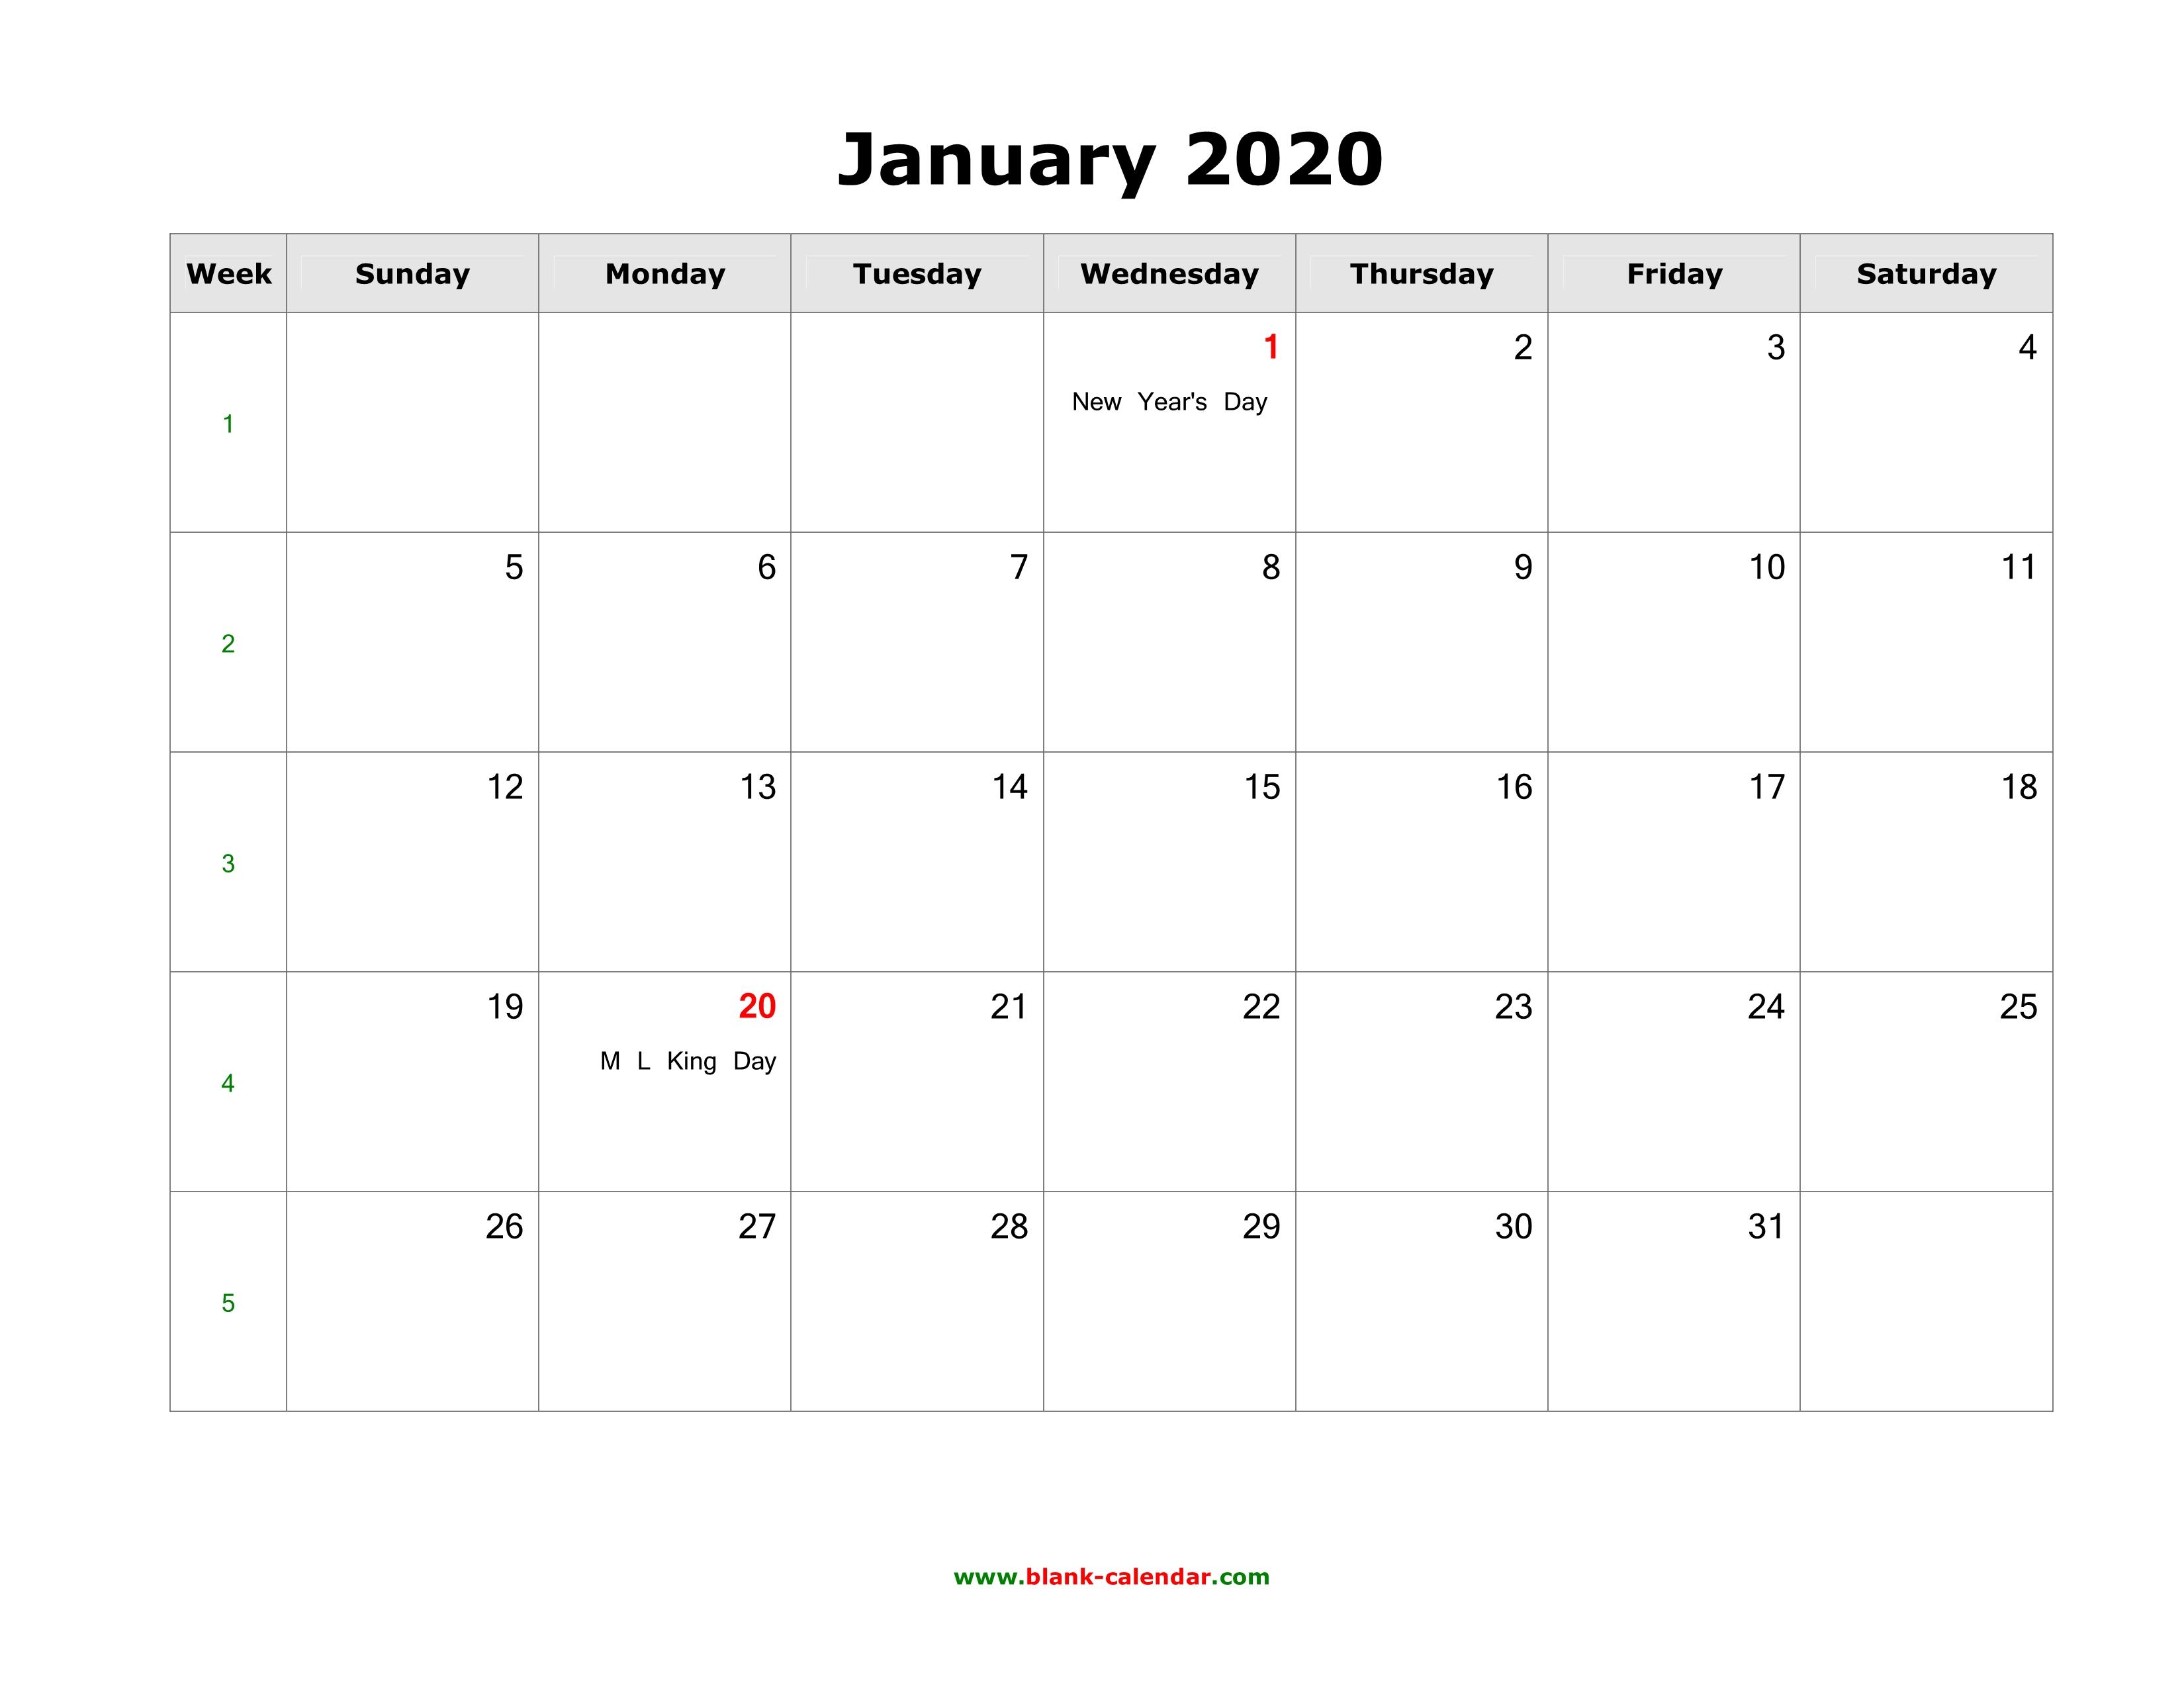 January 2020 Blank Calendar | Free Download Calendar Templates inside Wincalendar January 2020